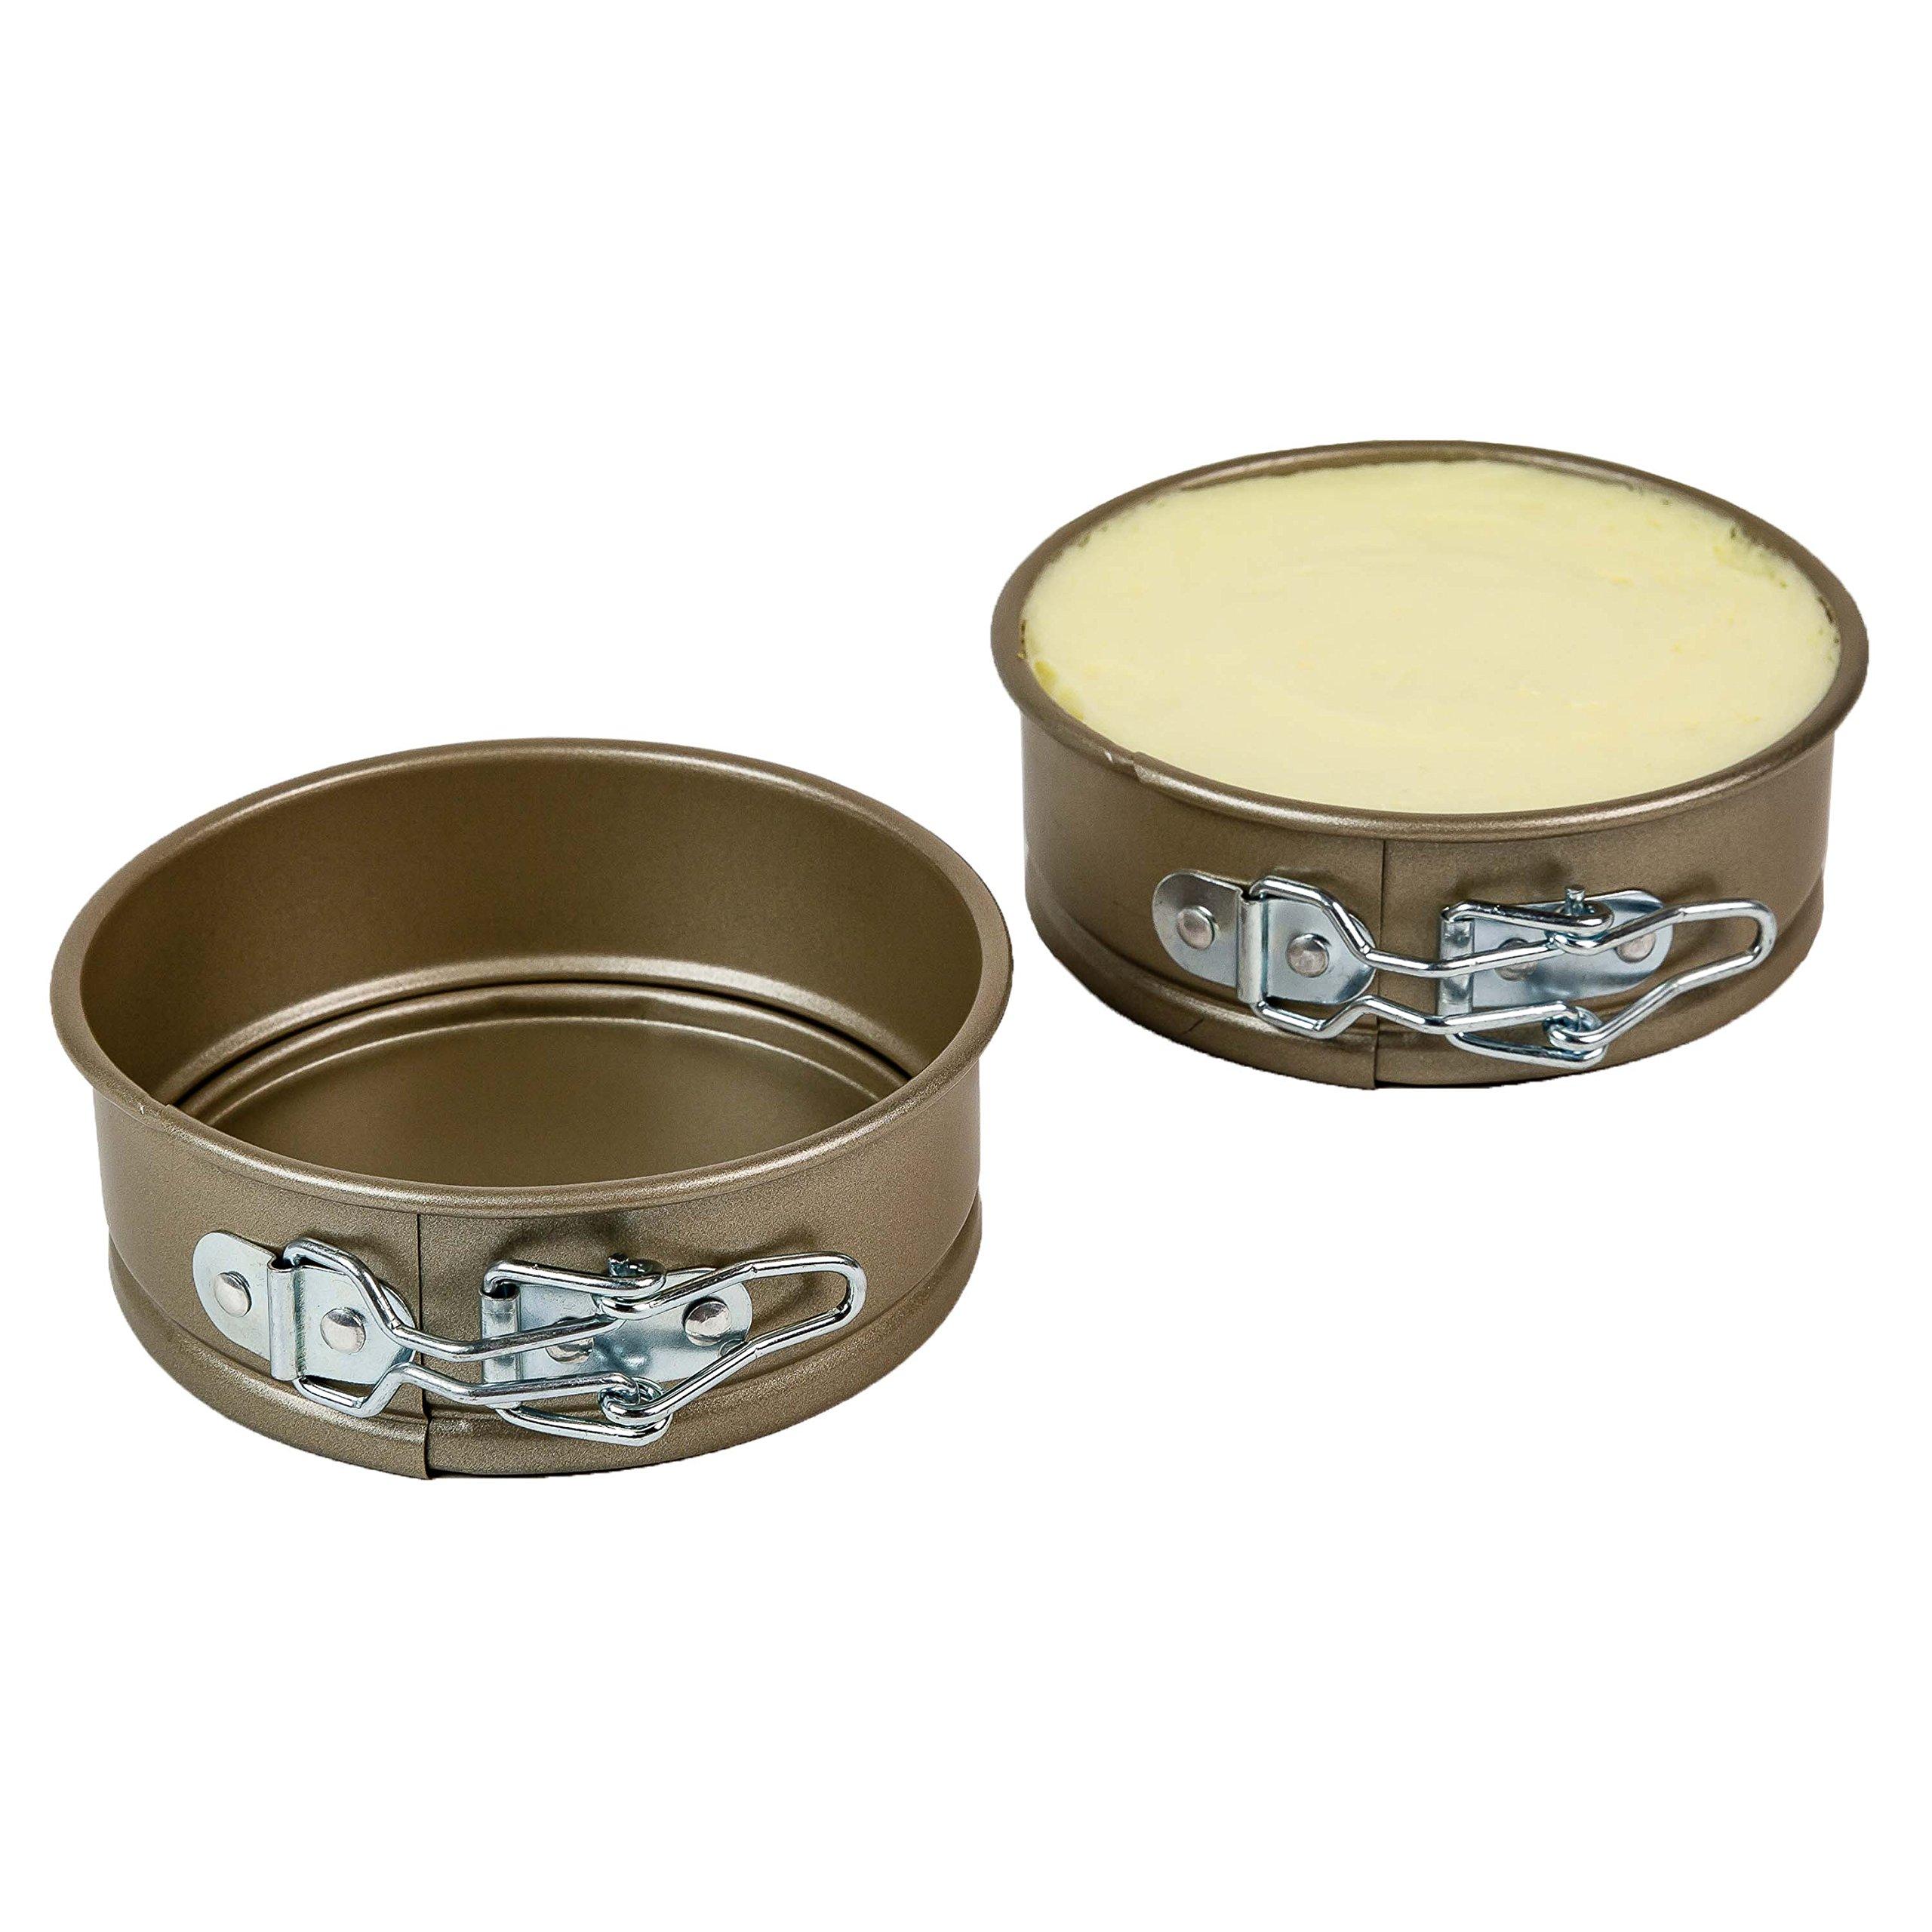 Ecolution Bakeins Mini Springform Cake Pan - 2pc, Champagne - Single Serving Bakeware